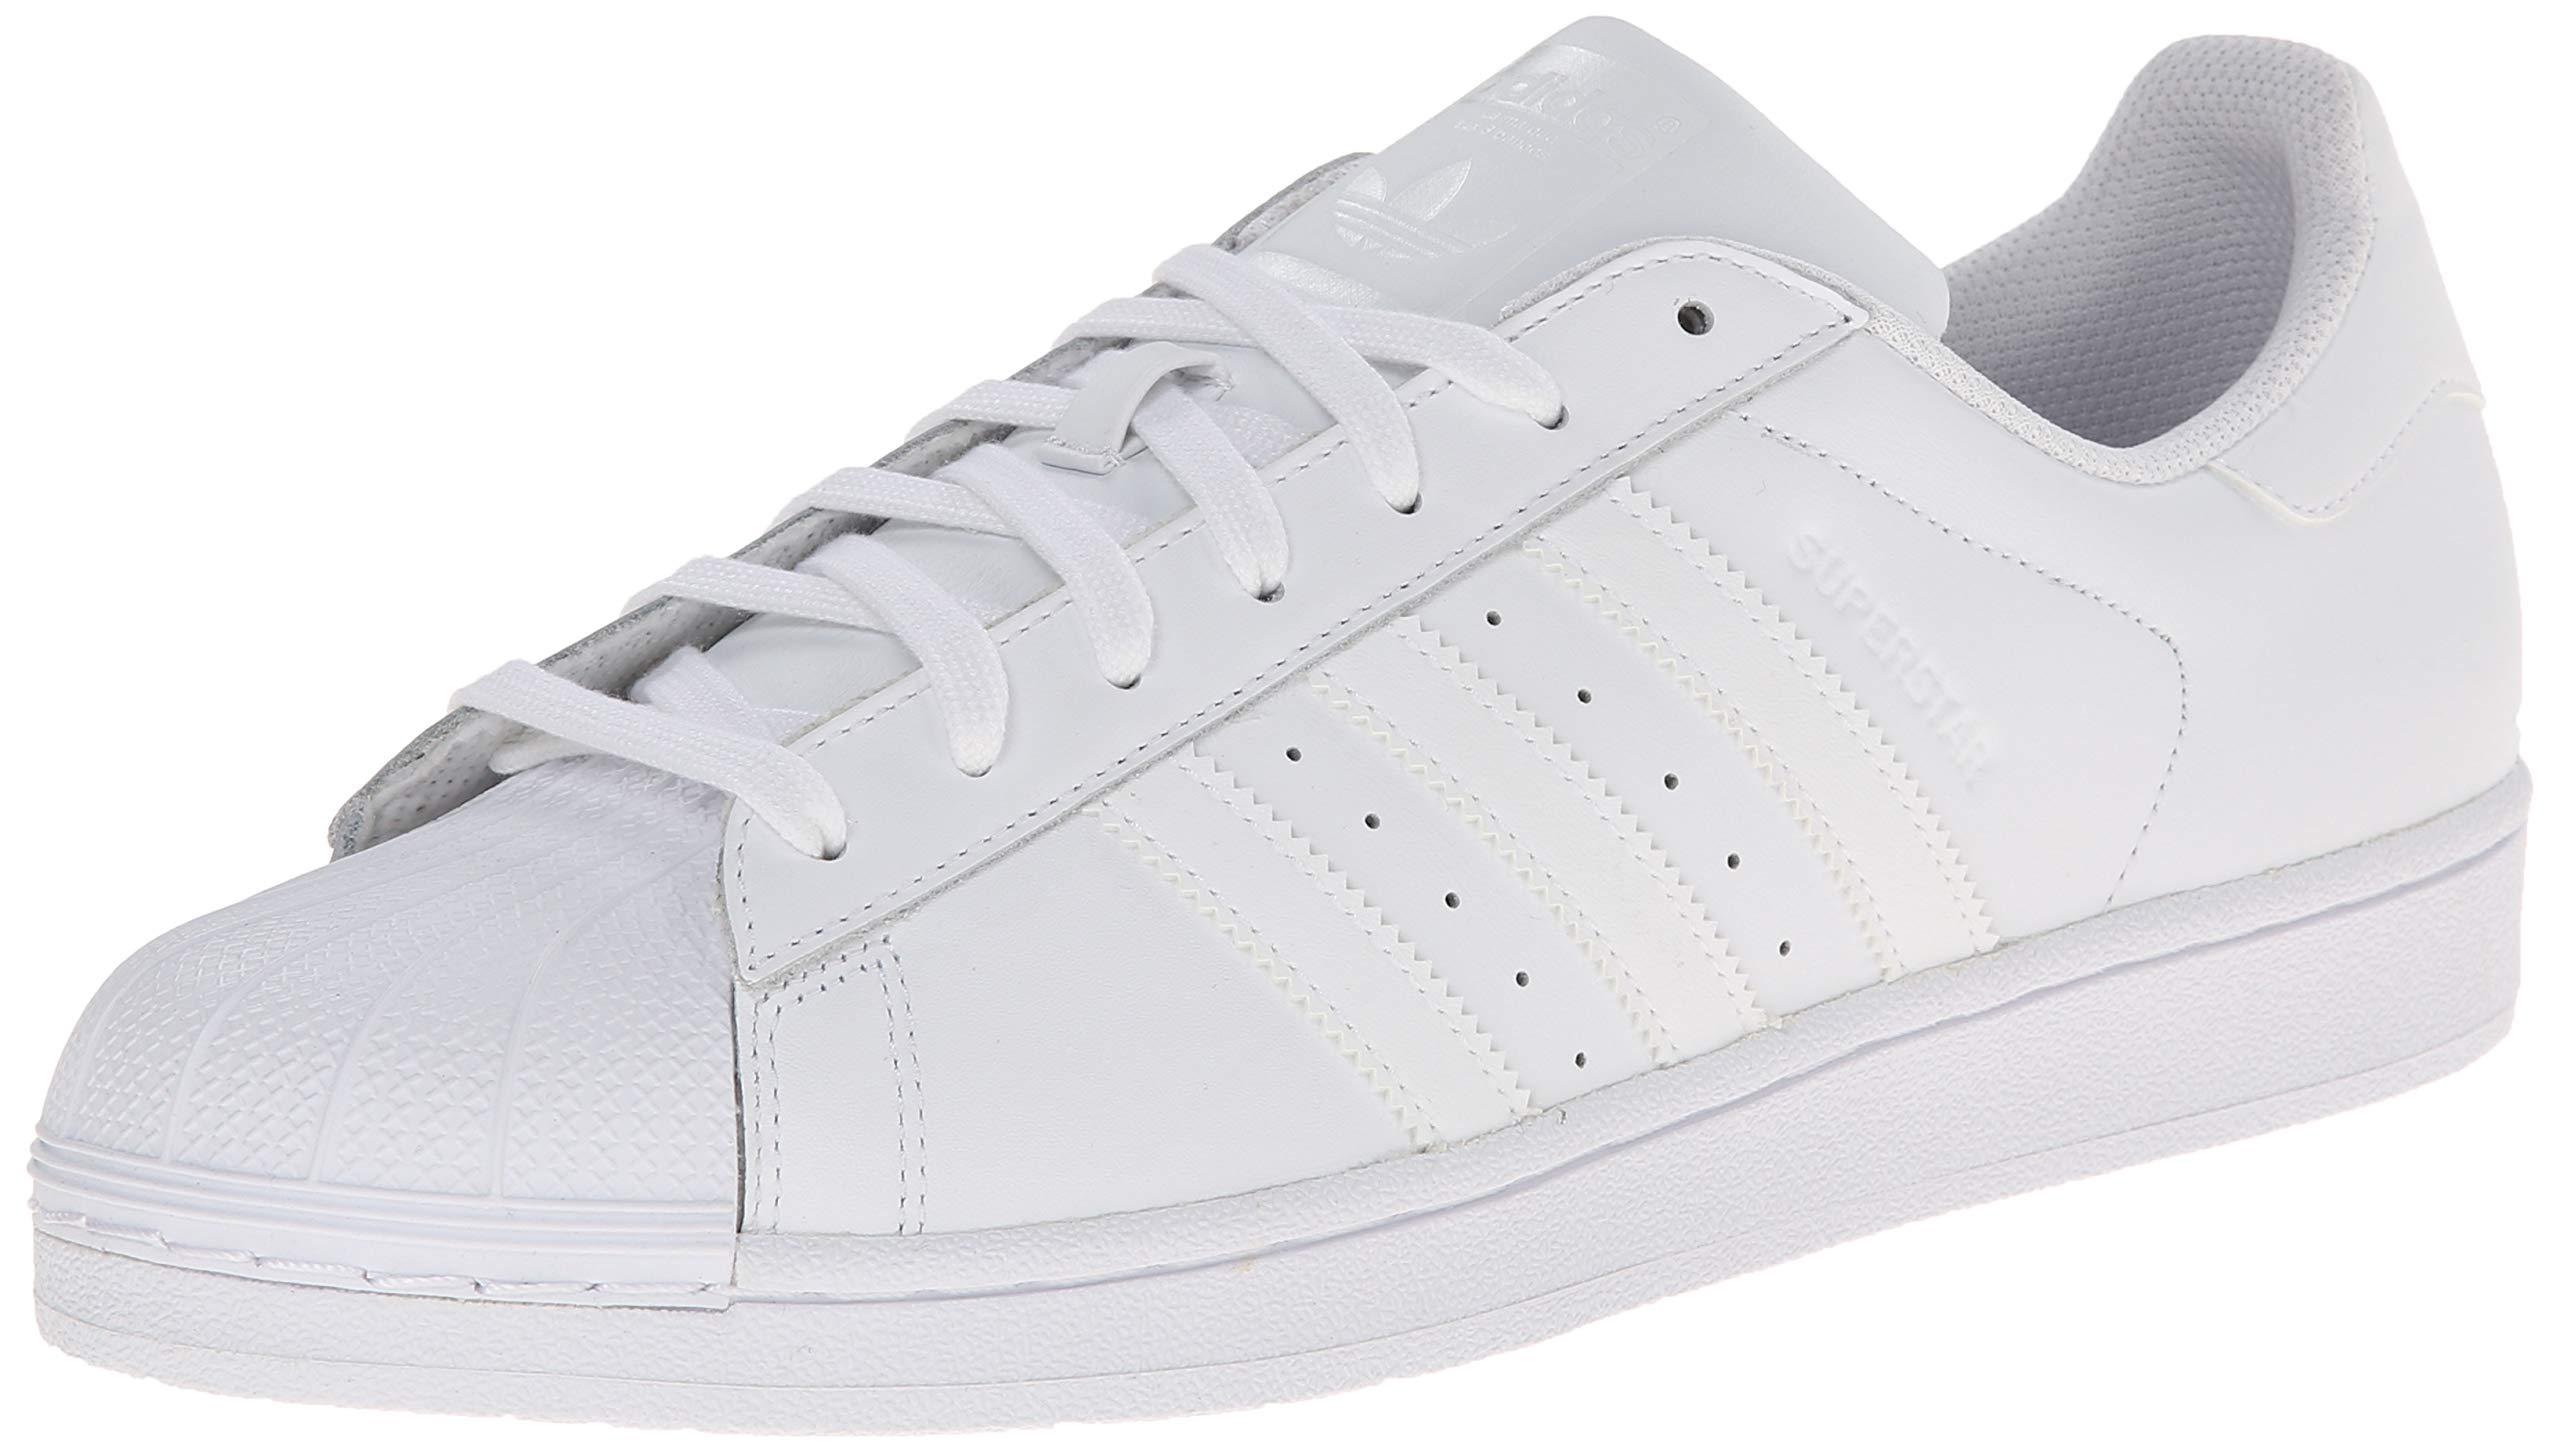 d743332224dc3 adidas Originals Men's Superstar Foundation Casual Sneaker, White/Running  White/White, 7.5 D(M) US